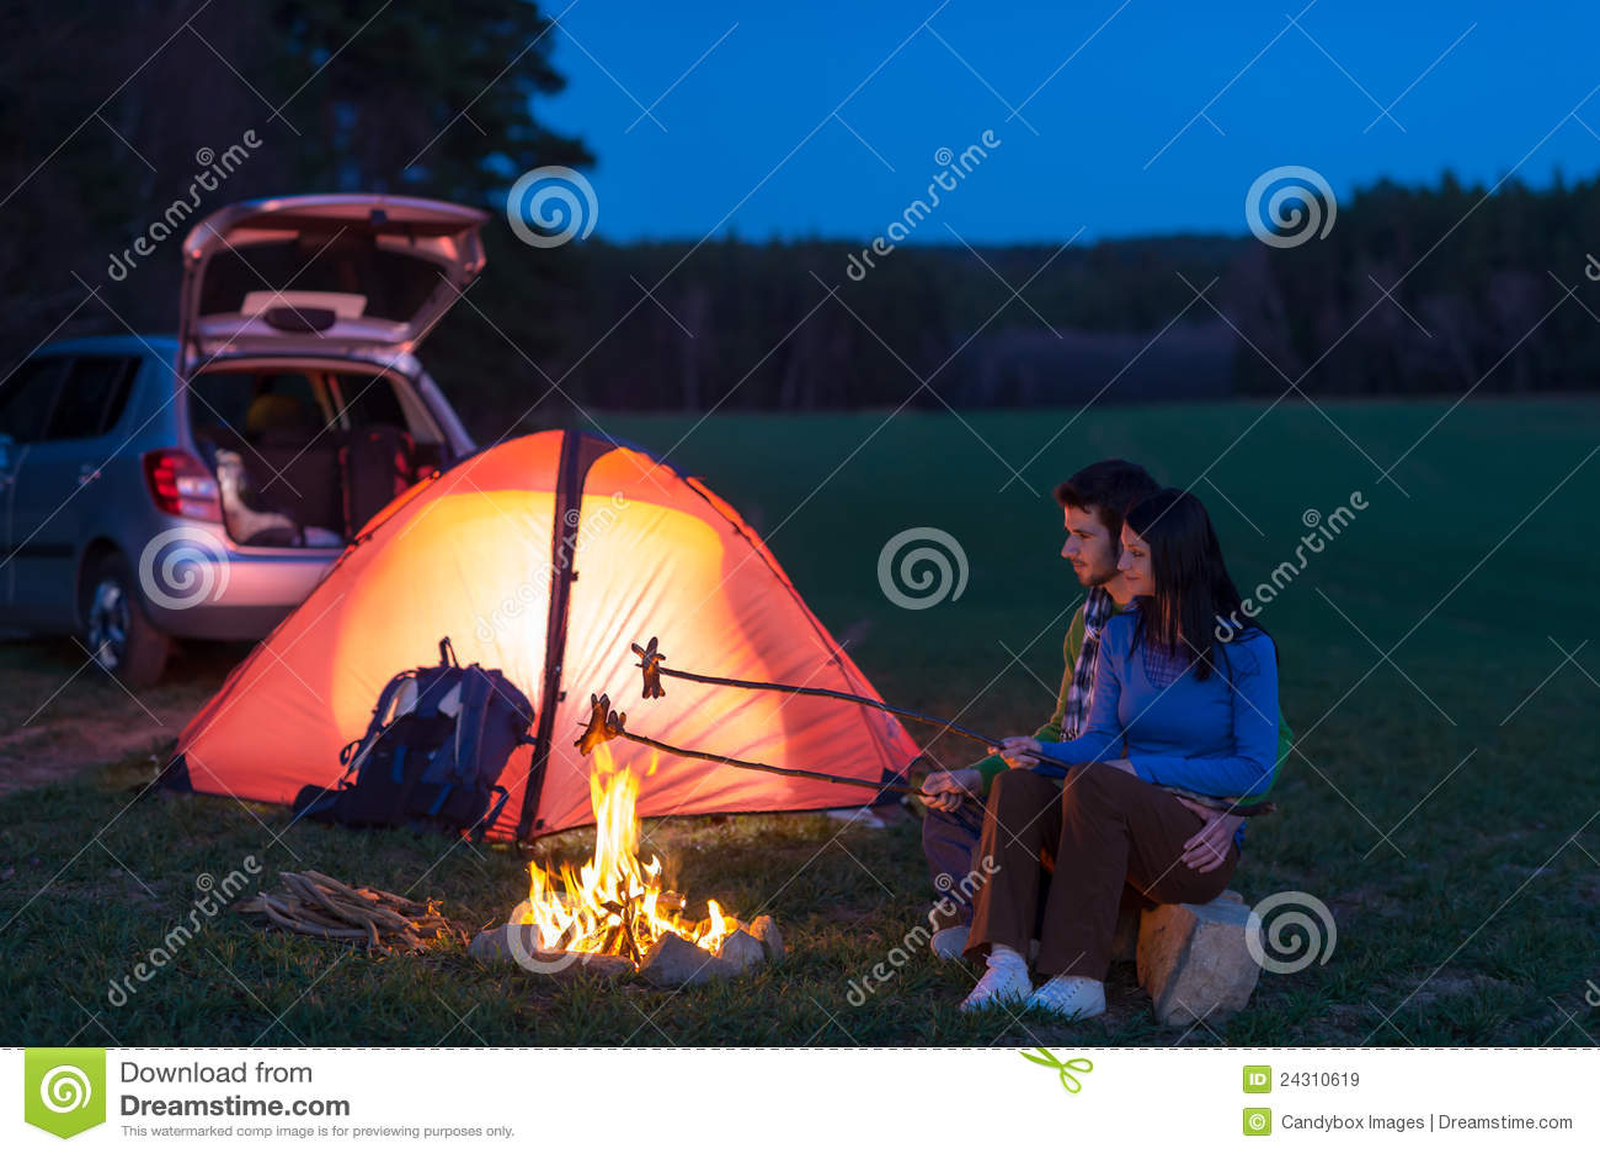 Tent c&ing car couple sitting by bonfire  sc 1 st  Dreamstime.com & Tent Camping Car Couple Sitting By Bonfire Stock Image - Image of ...